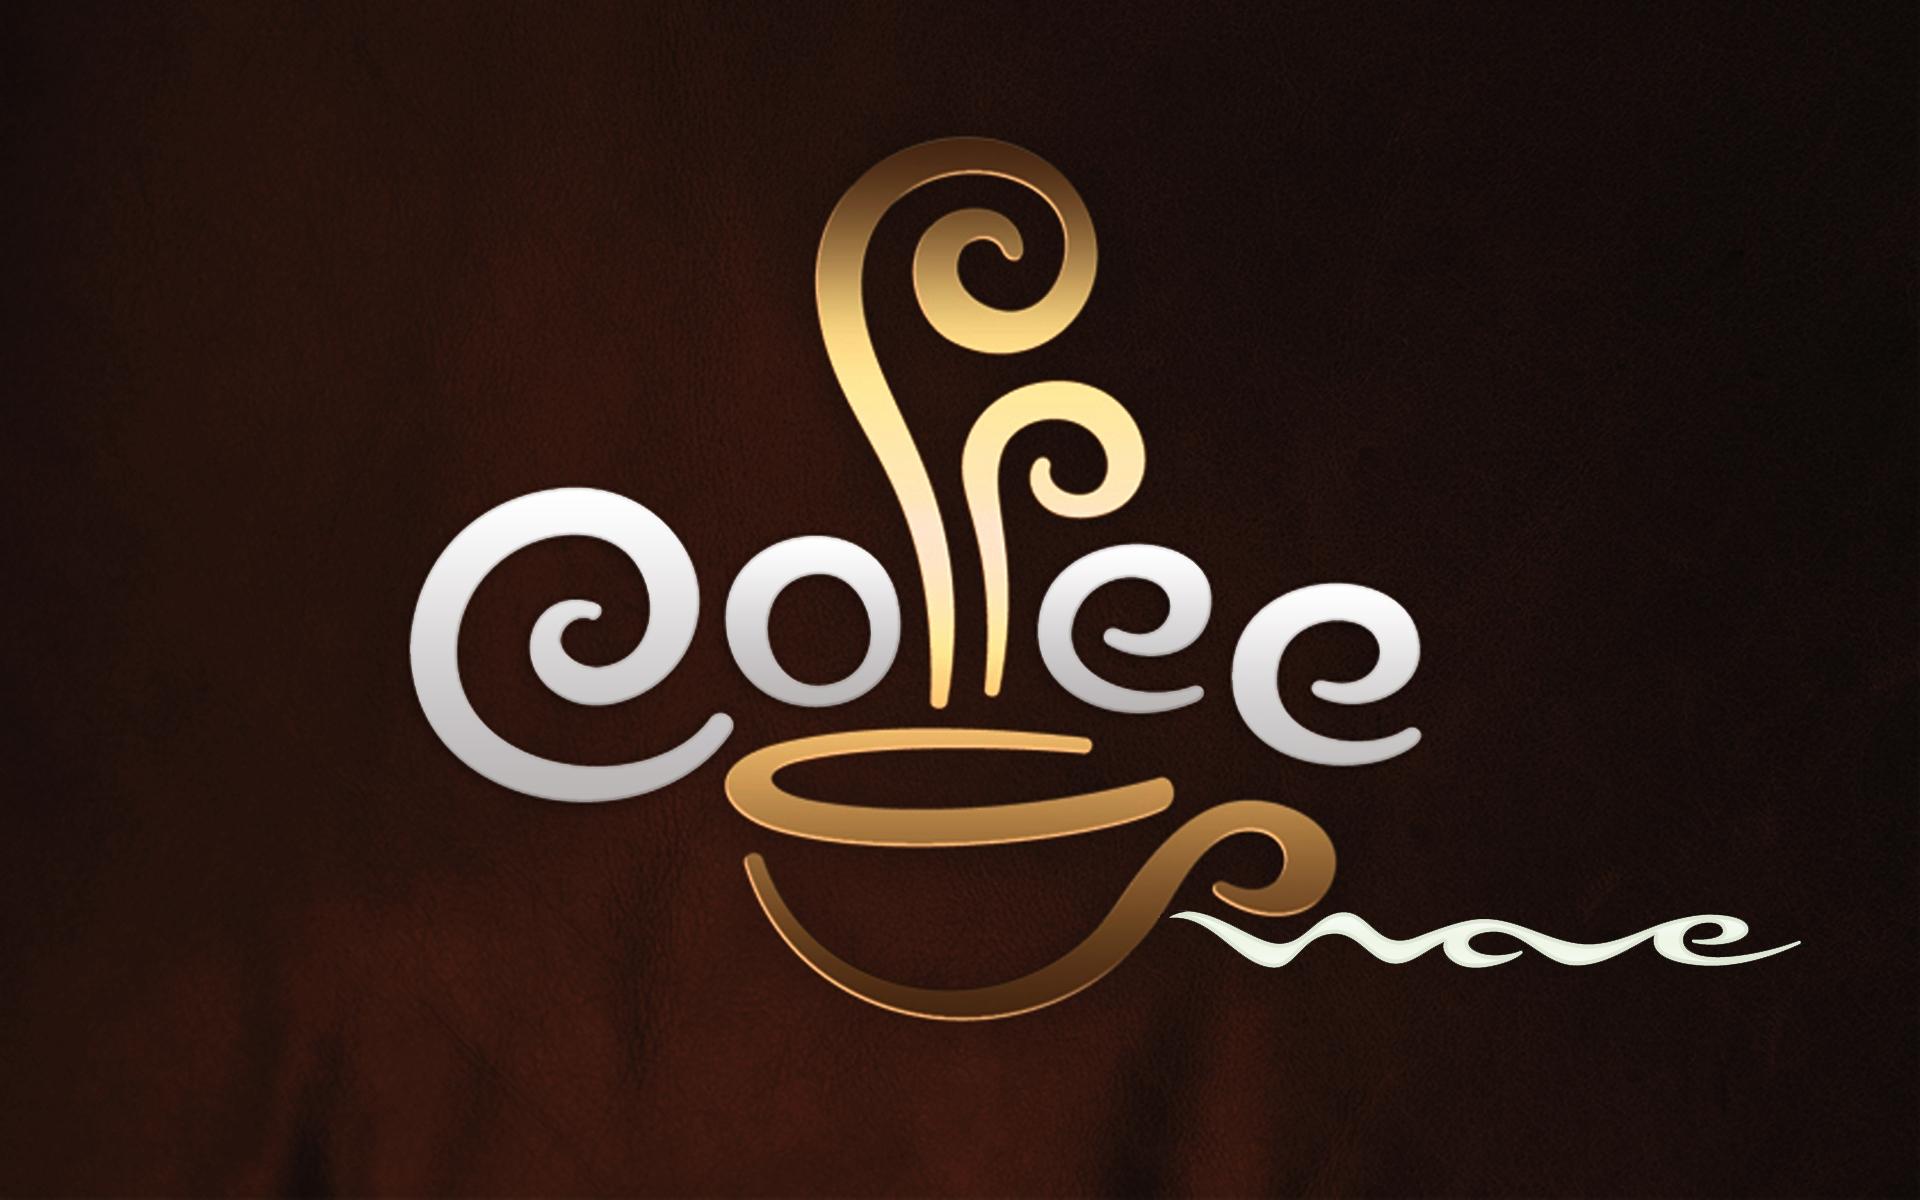 Coffee Cup Wallpaper   Download Wallpaper 1920x1200